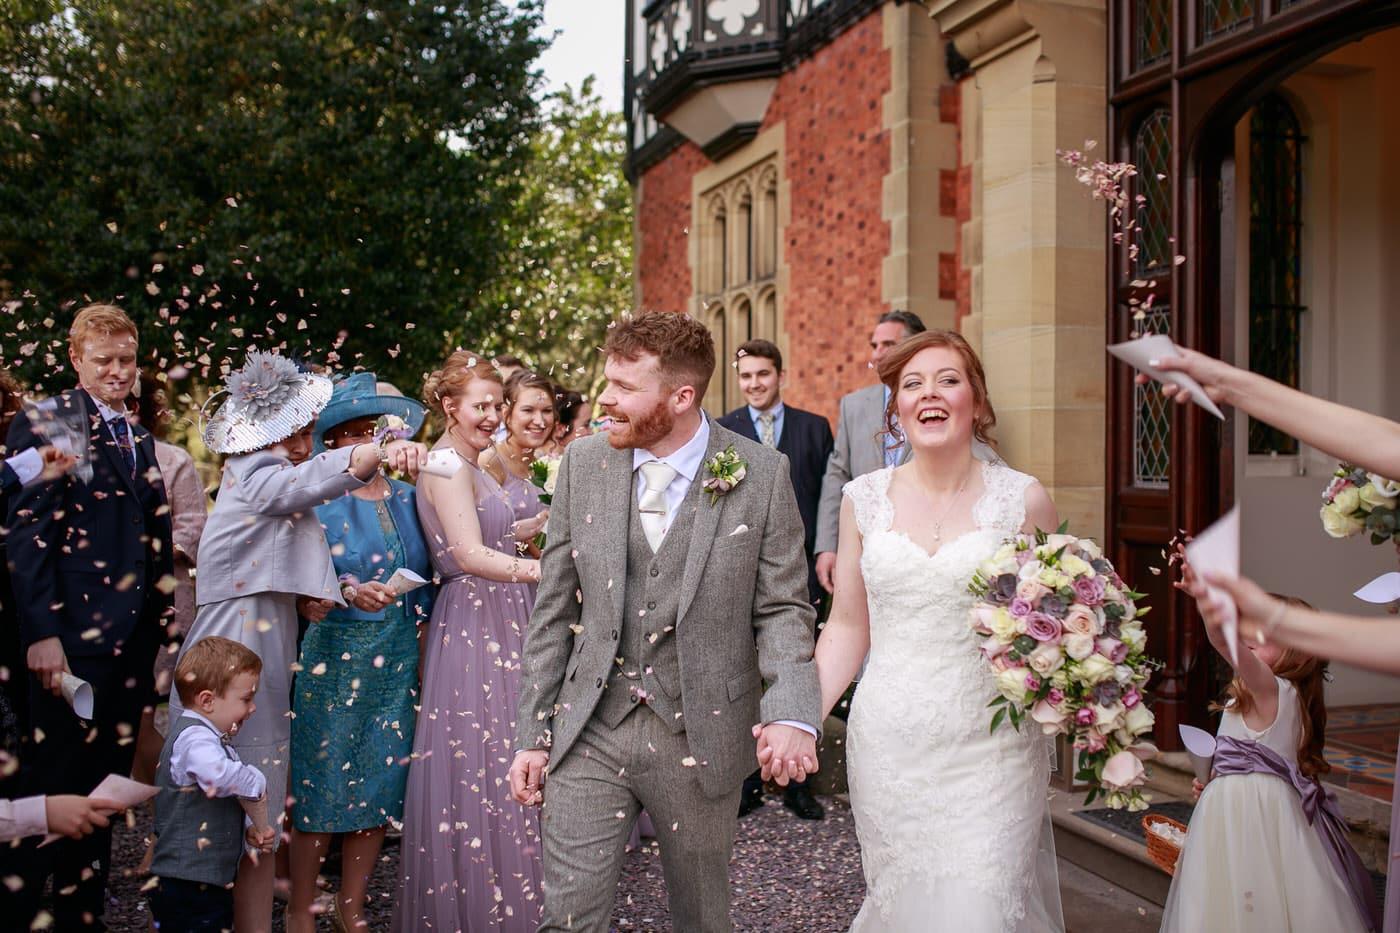 Bride and groom get showered by confetti at Tyn Dwr Hall wedding